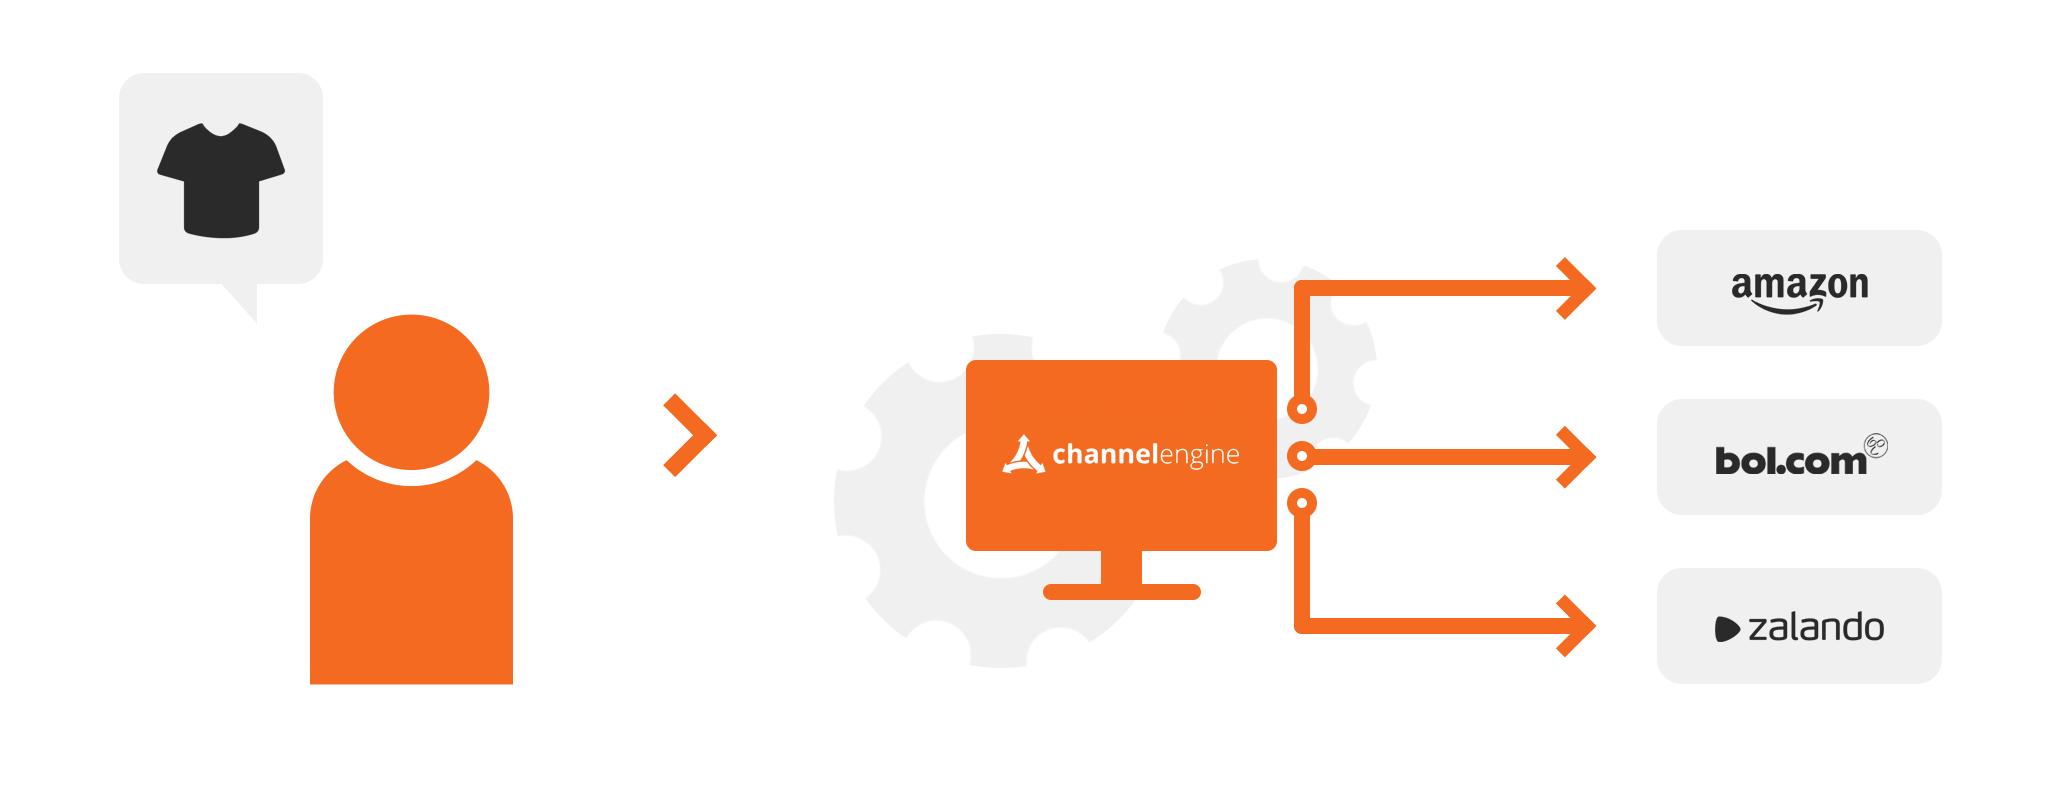 Brandsom Visual - Integratie (Channel Engine)